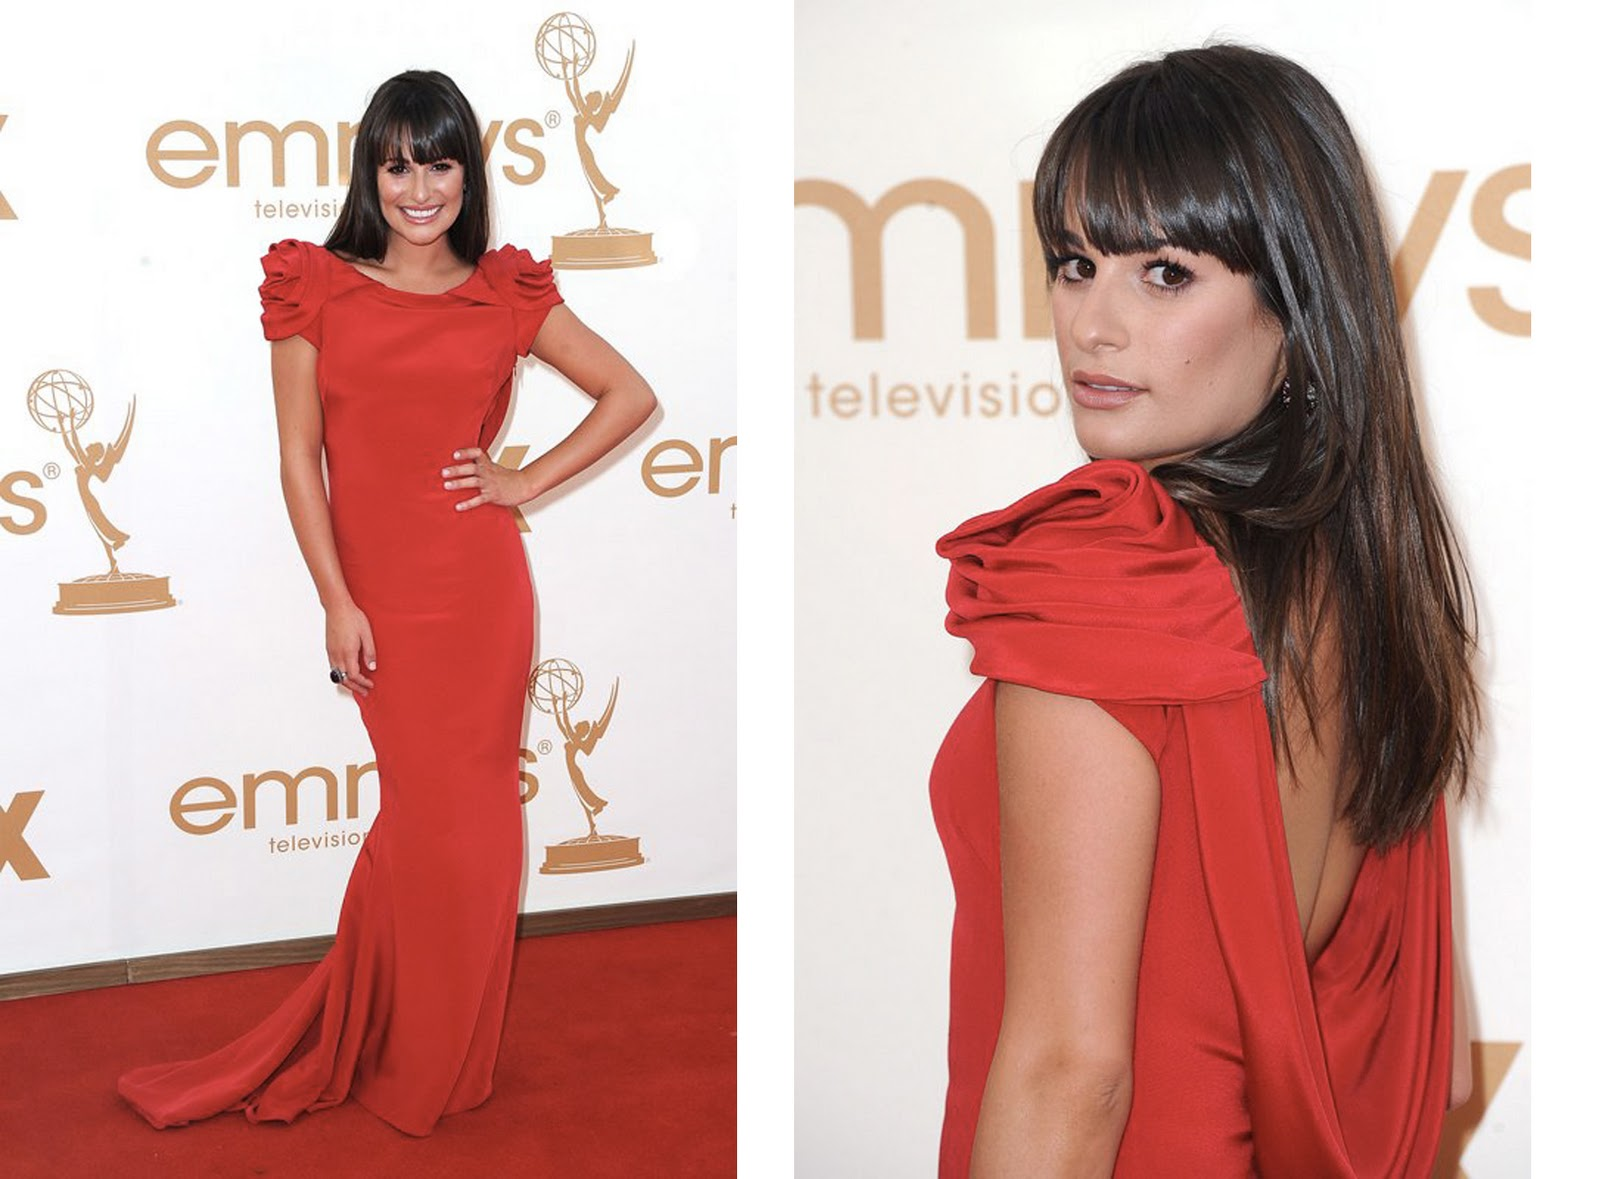 http://3.bp.blogspot.com/-JVRE0q-Efp4/TnaURctIC3I/AAAAAAAAEME/1dUH0cMw_wI/s1600/Emmys+Lea+2011.jpg